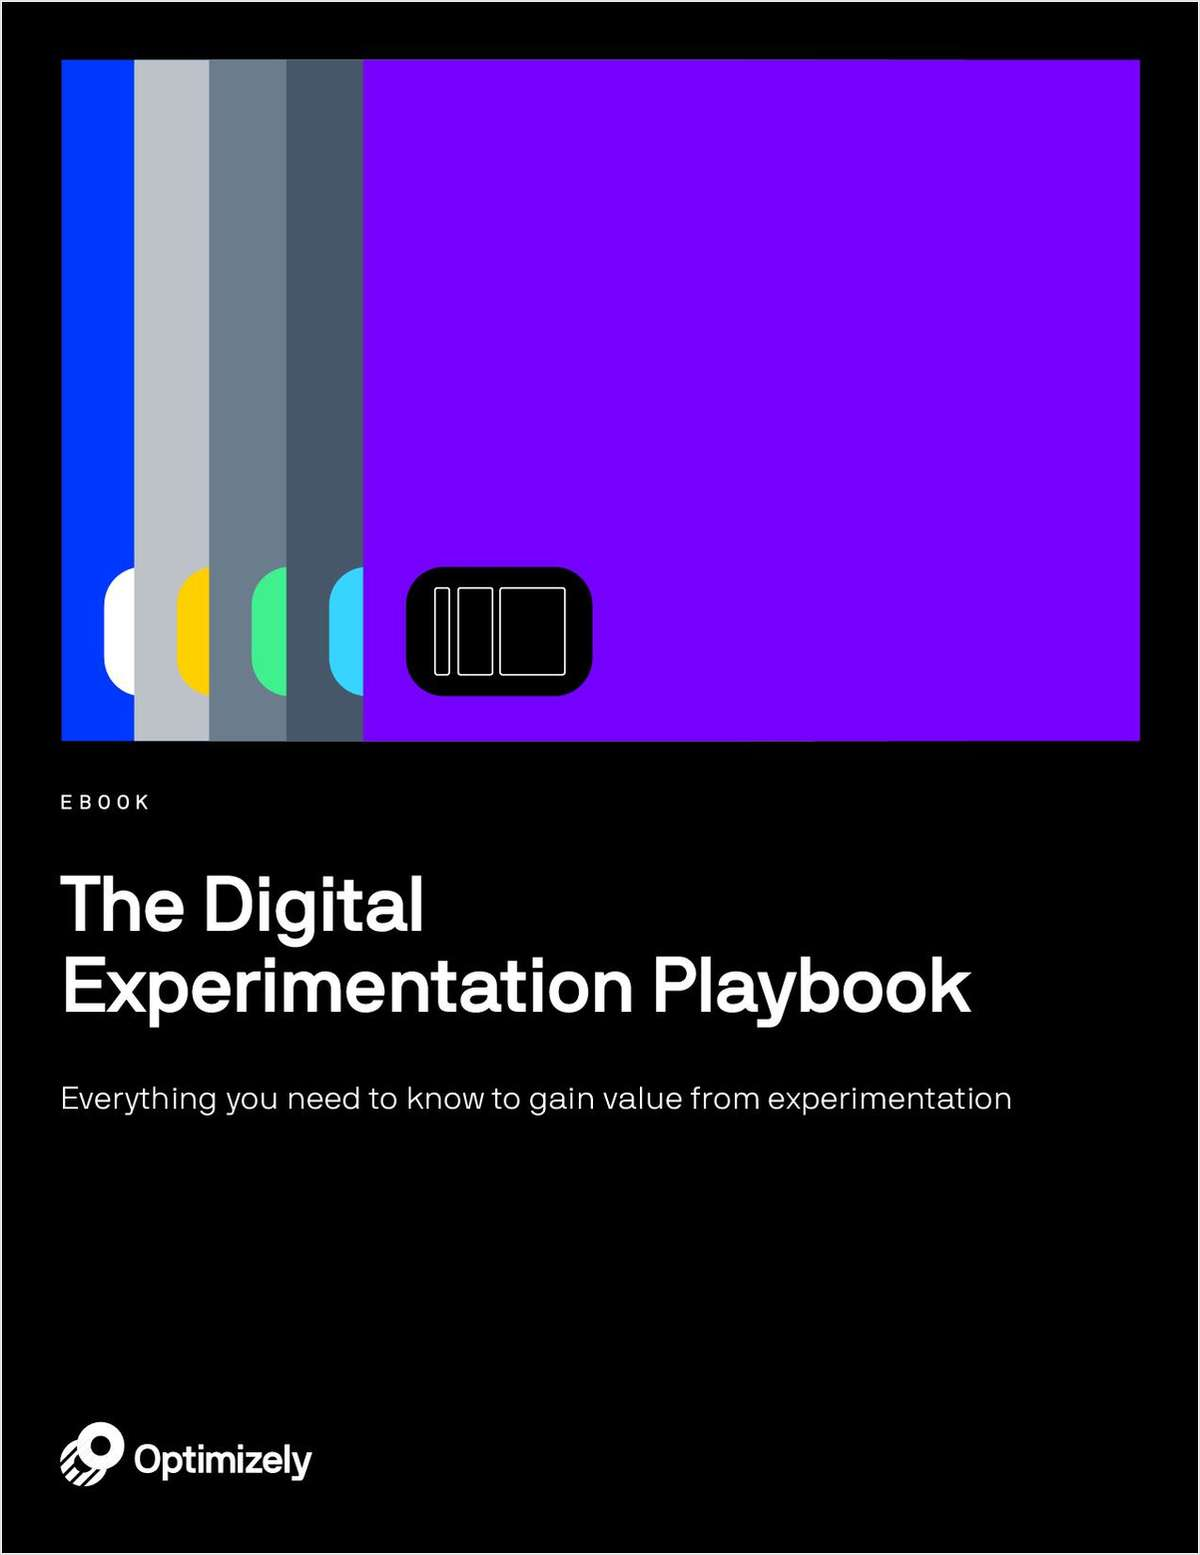 The Digital Experimentation Playbook